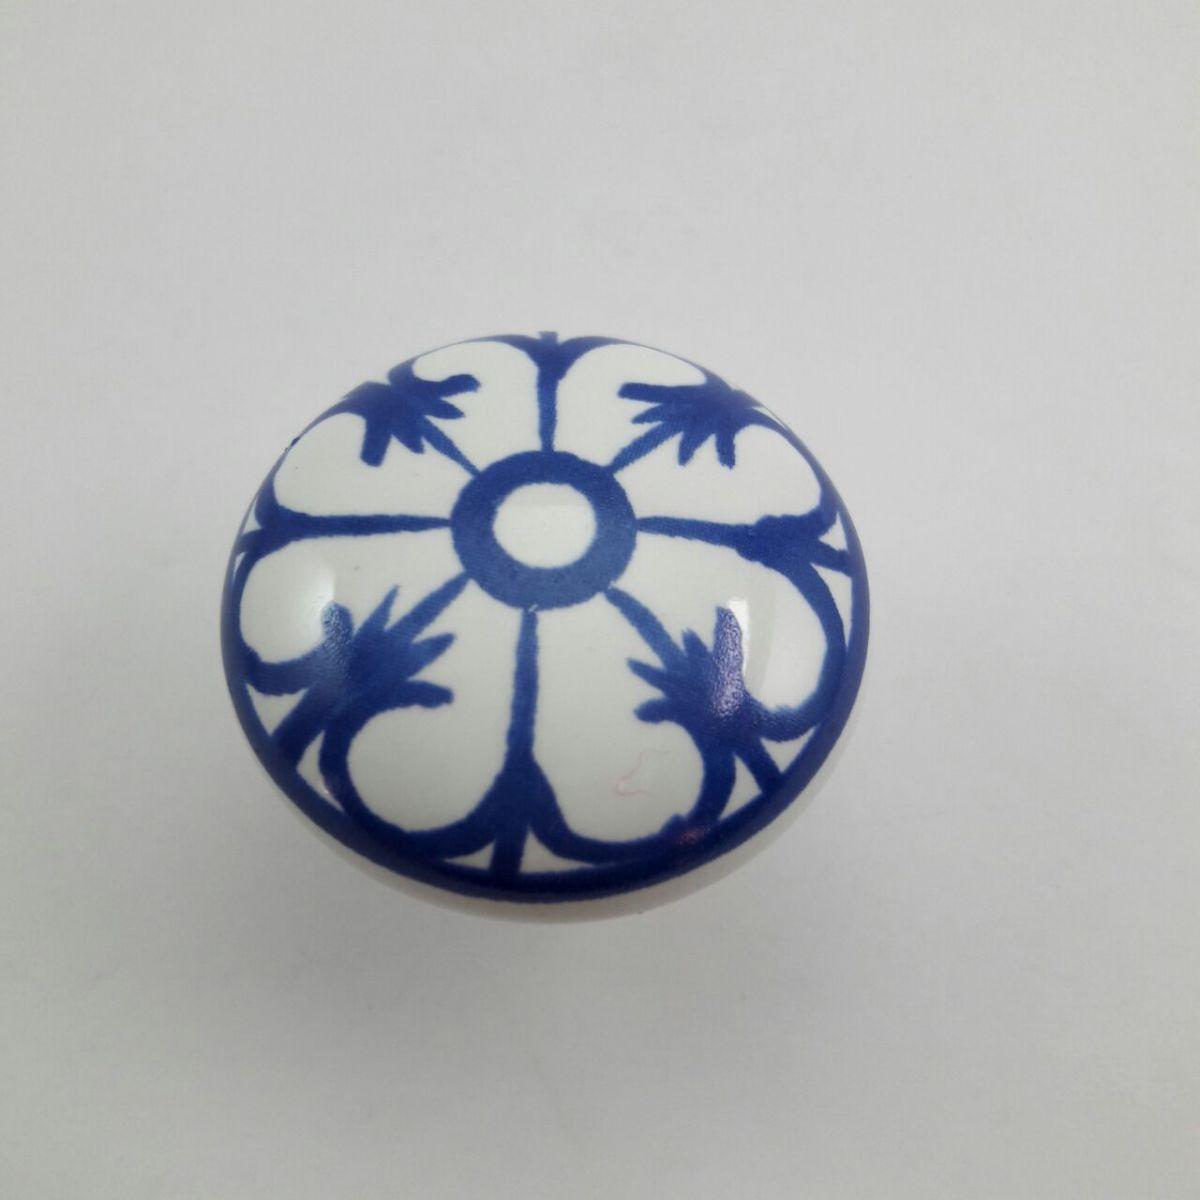 Puxador 7019 Azul MA0156